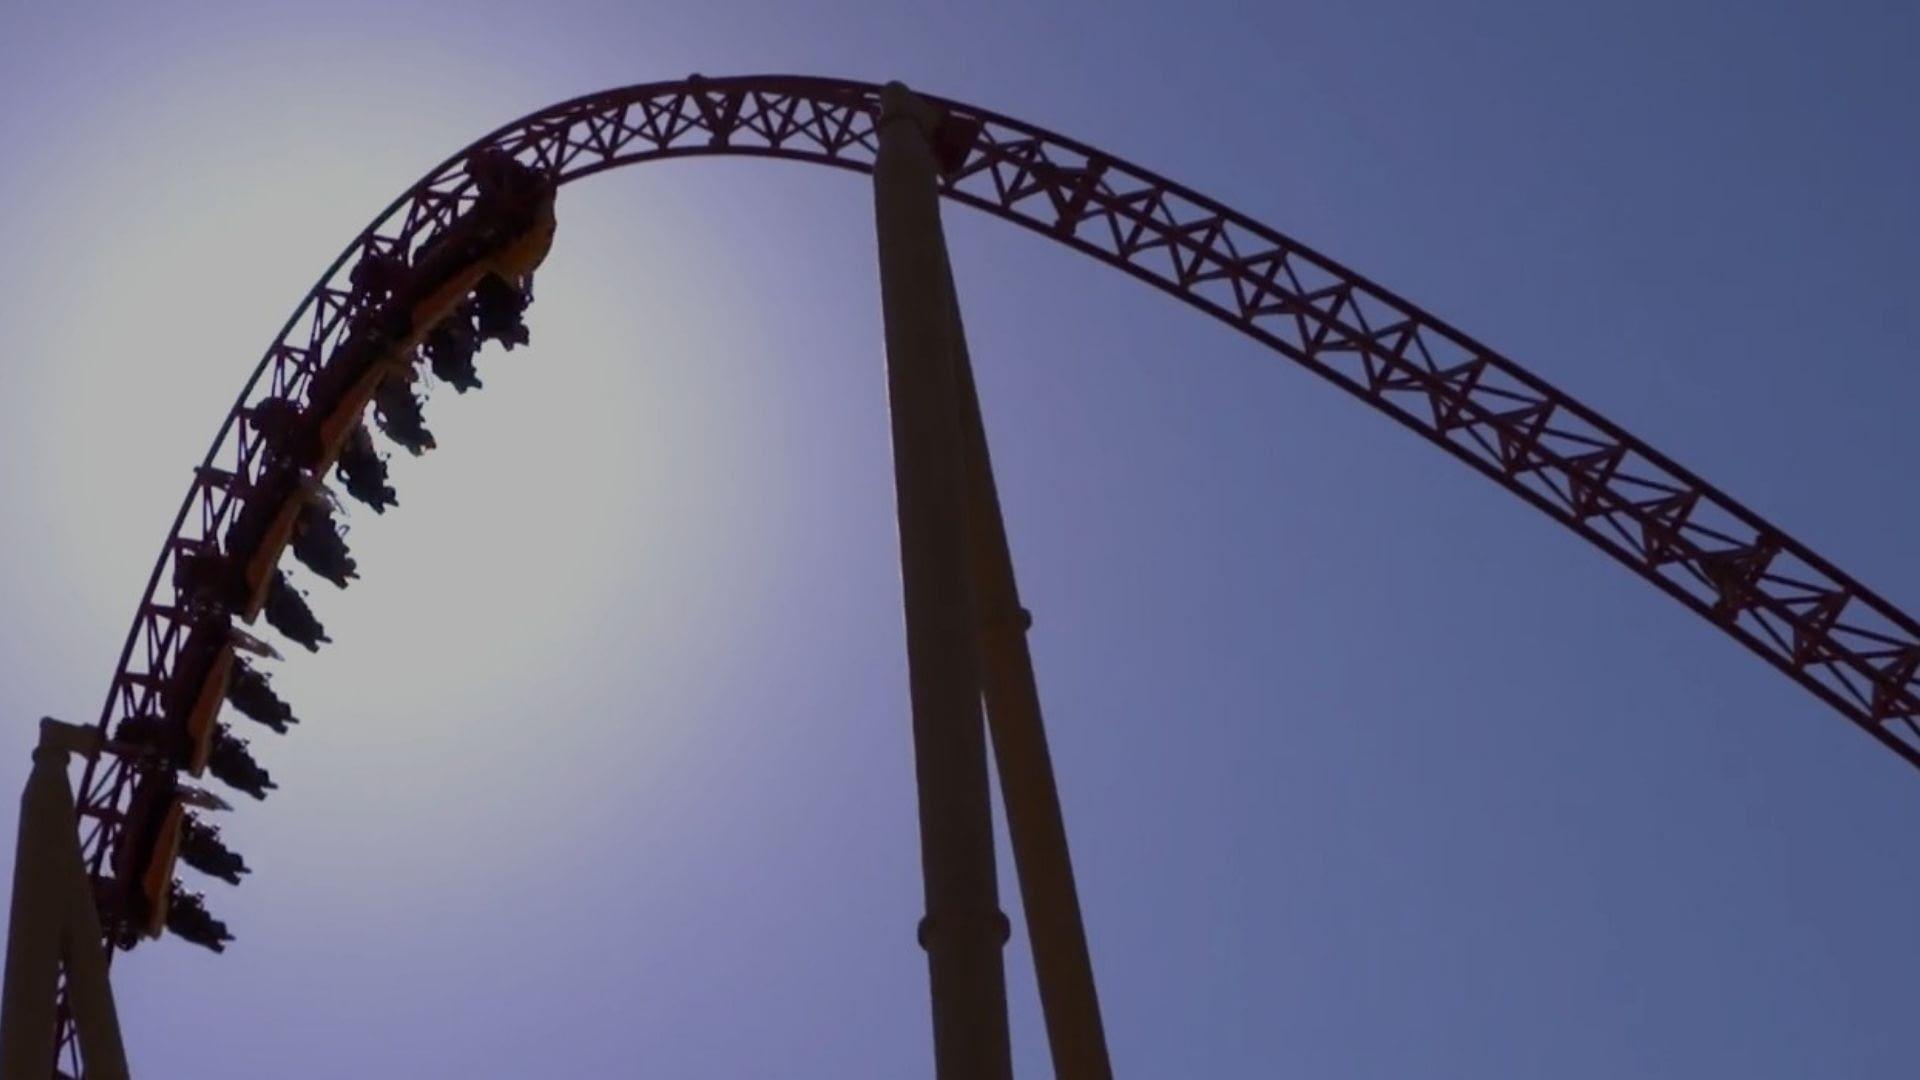 The Velociraptor Coaster at IMG Worlds of Adventure